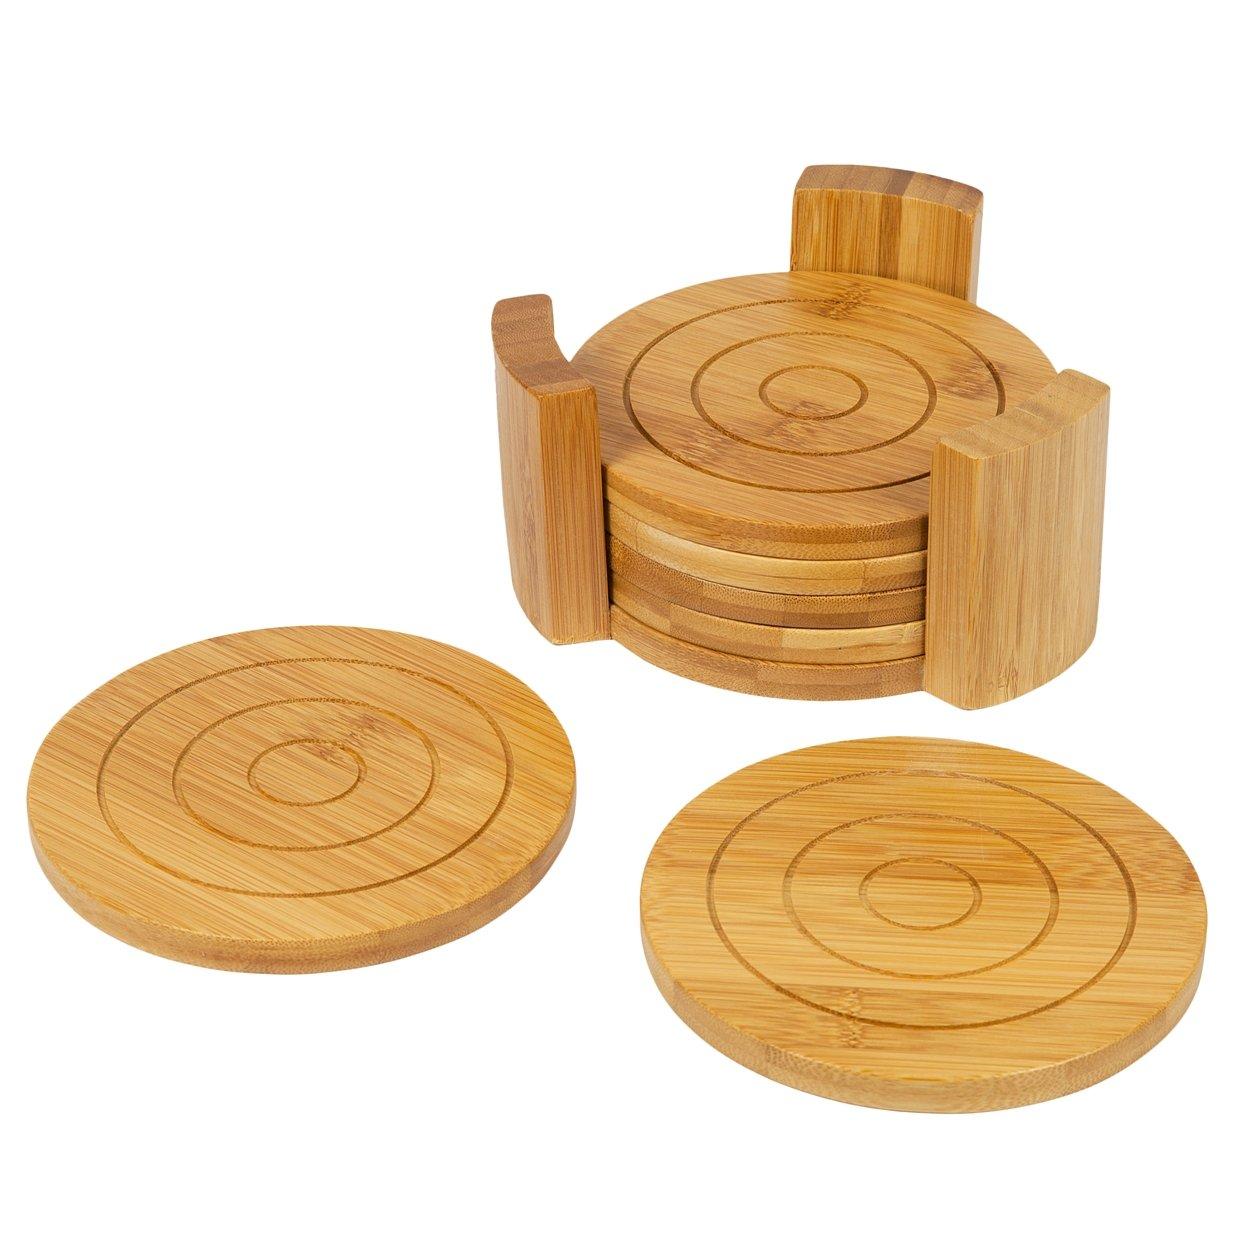 Multicolore woodluv Lot de sous-Verres Ronds//Support de Pot 6/pi/èces